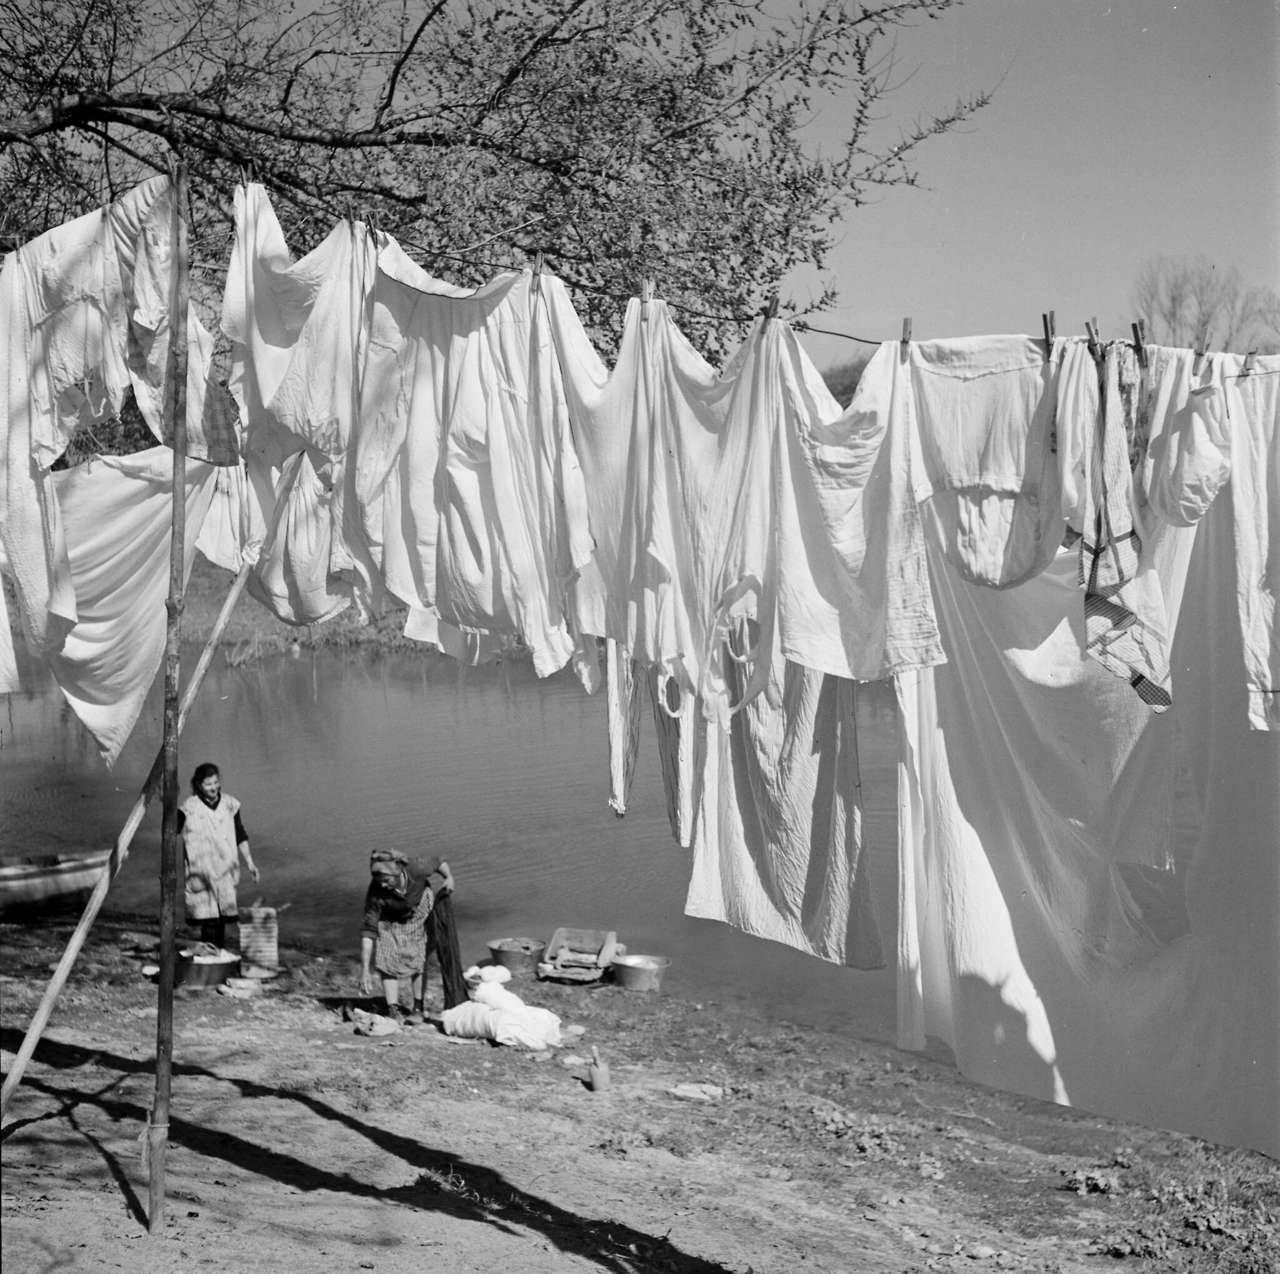 lago lavar roupa